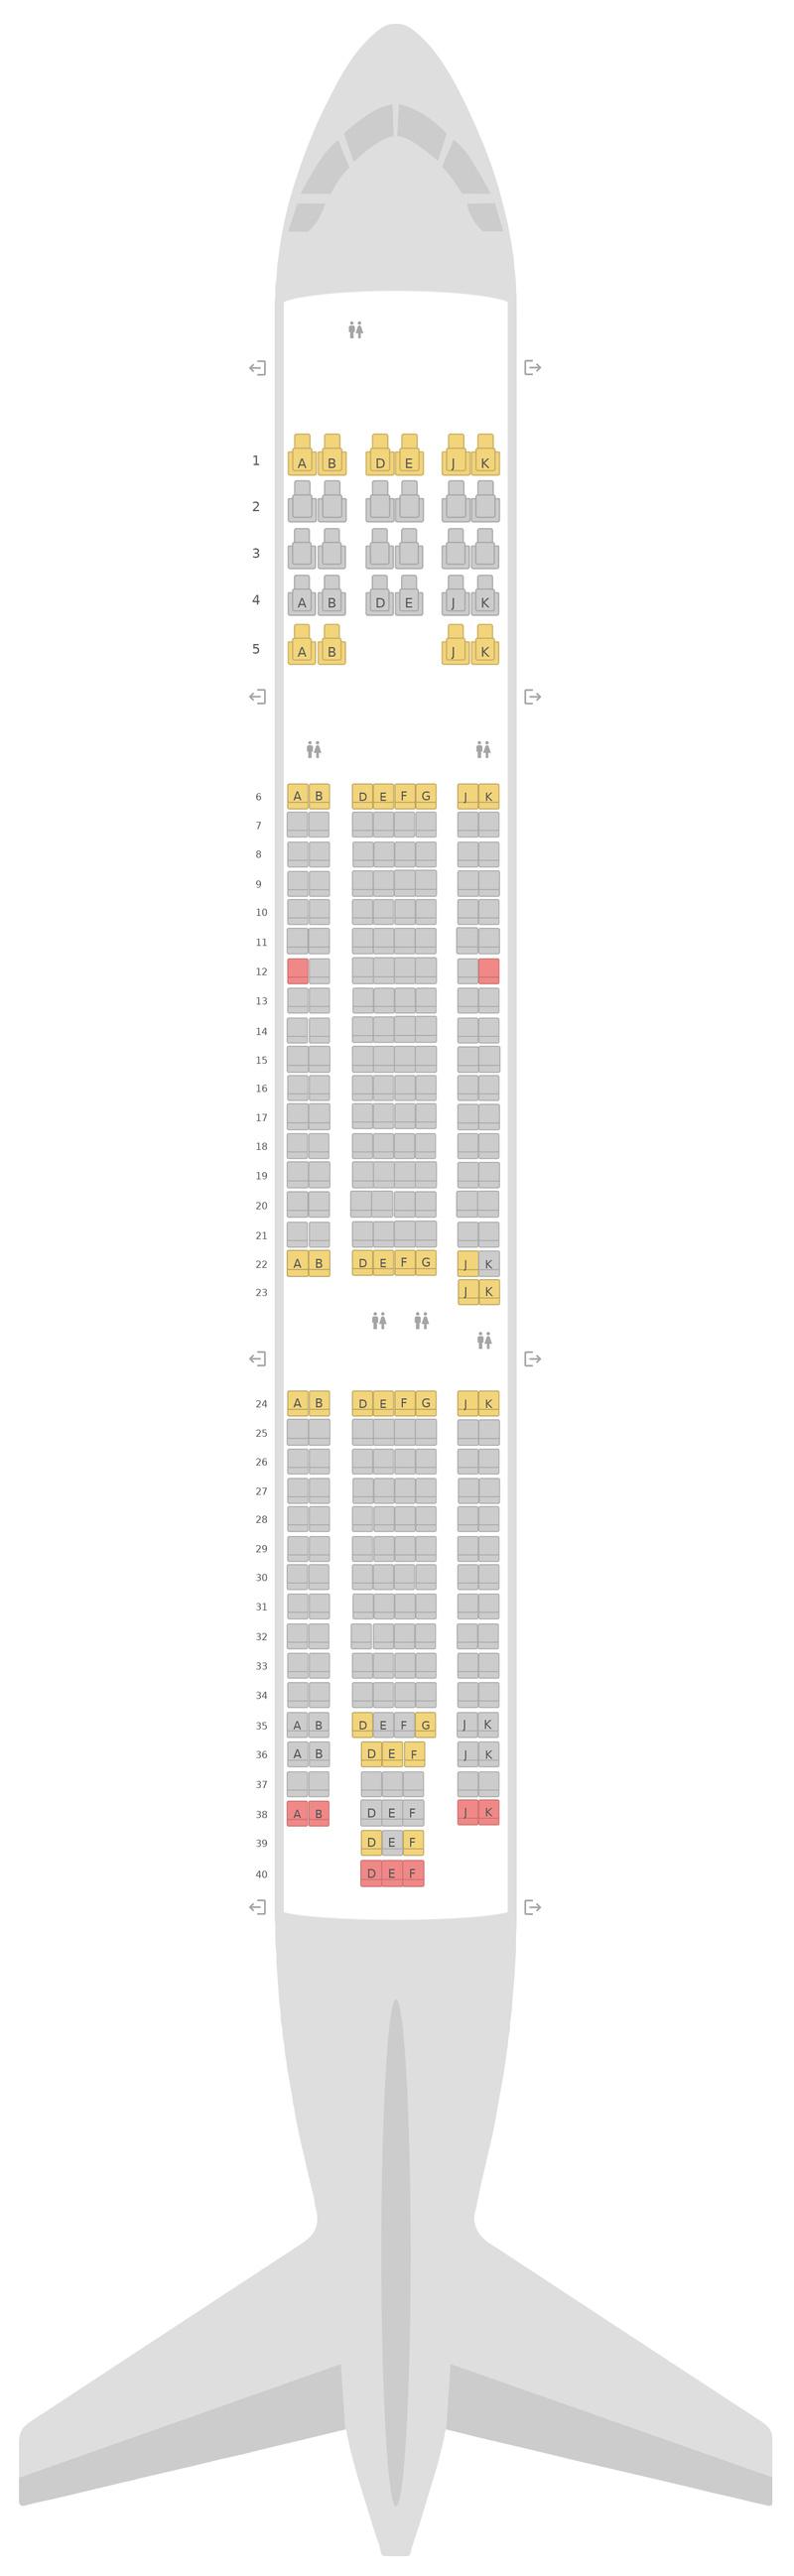 Sitzplan Airbus A330-300 (333) Turkish Airlines